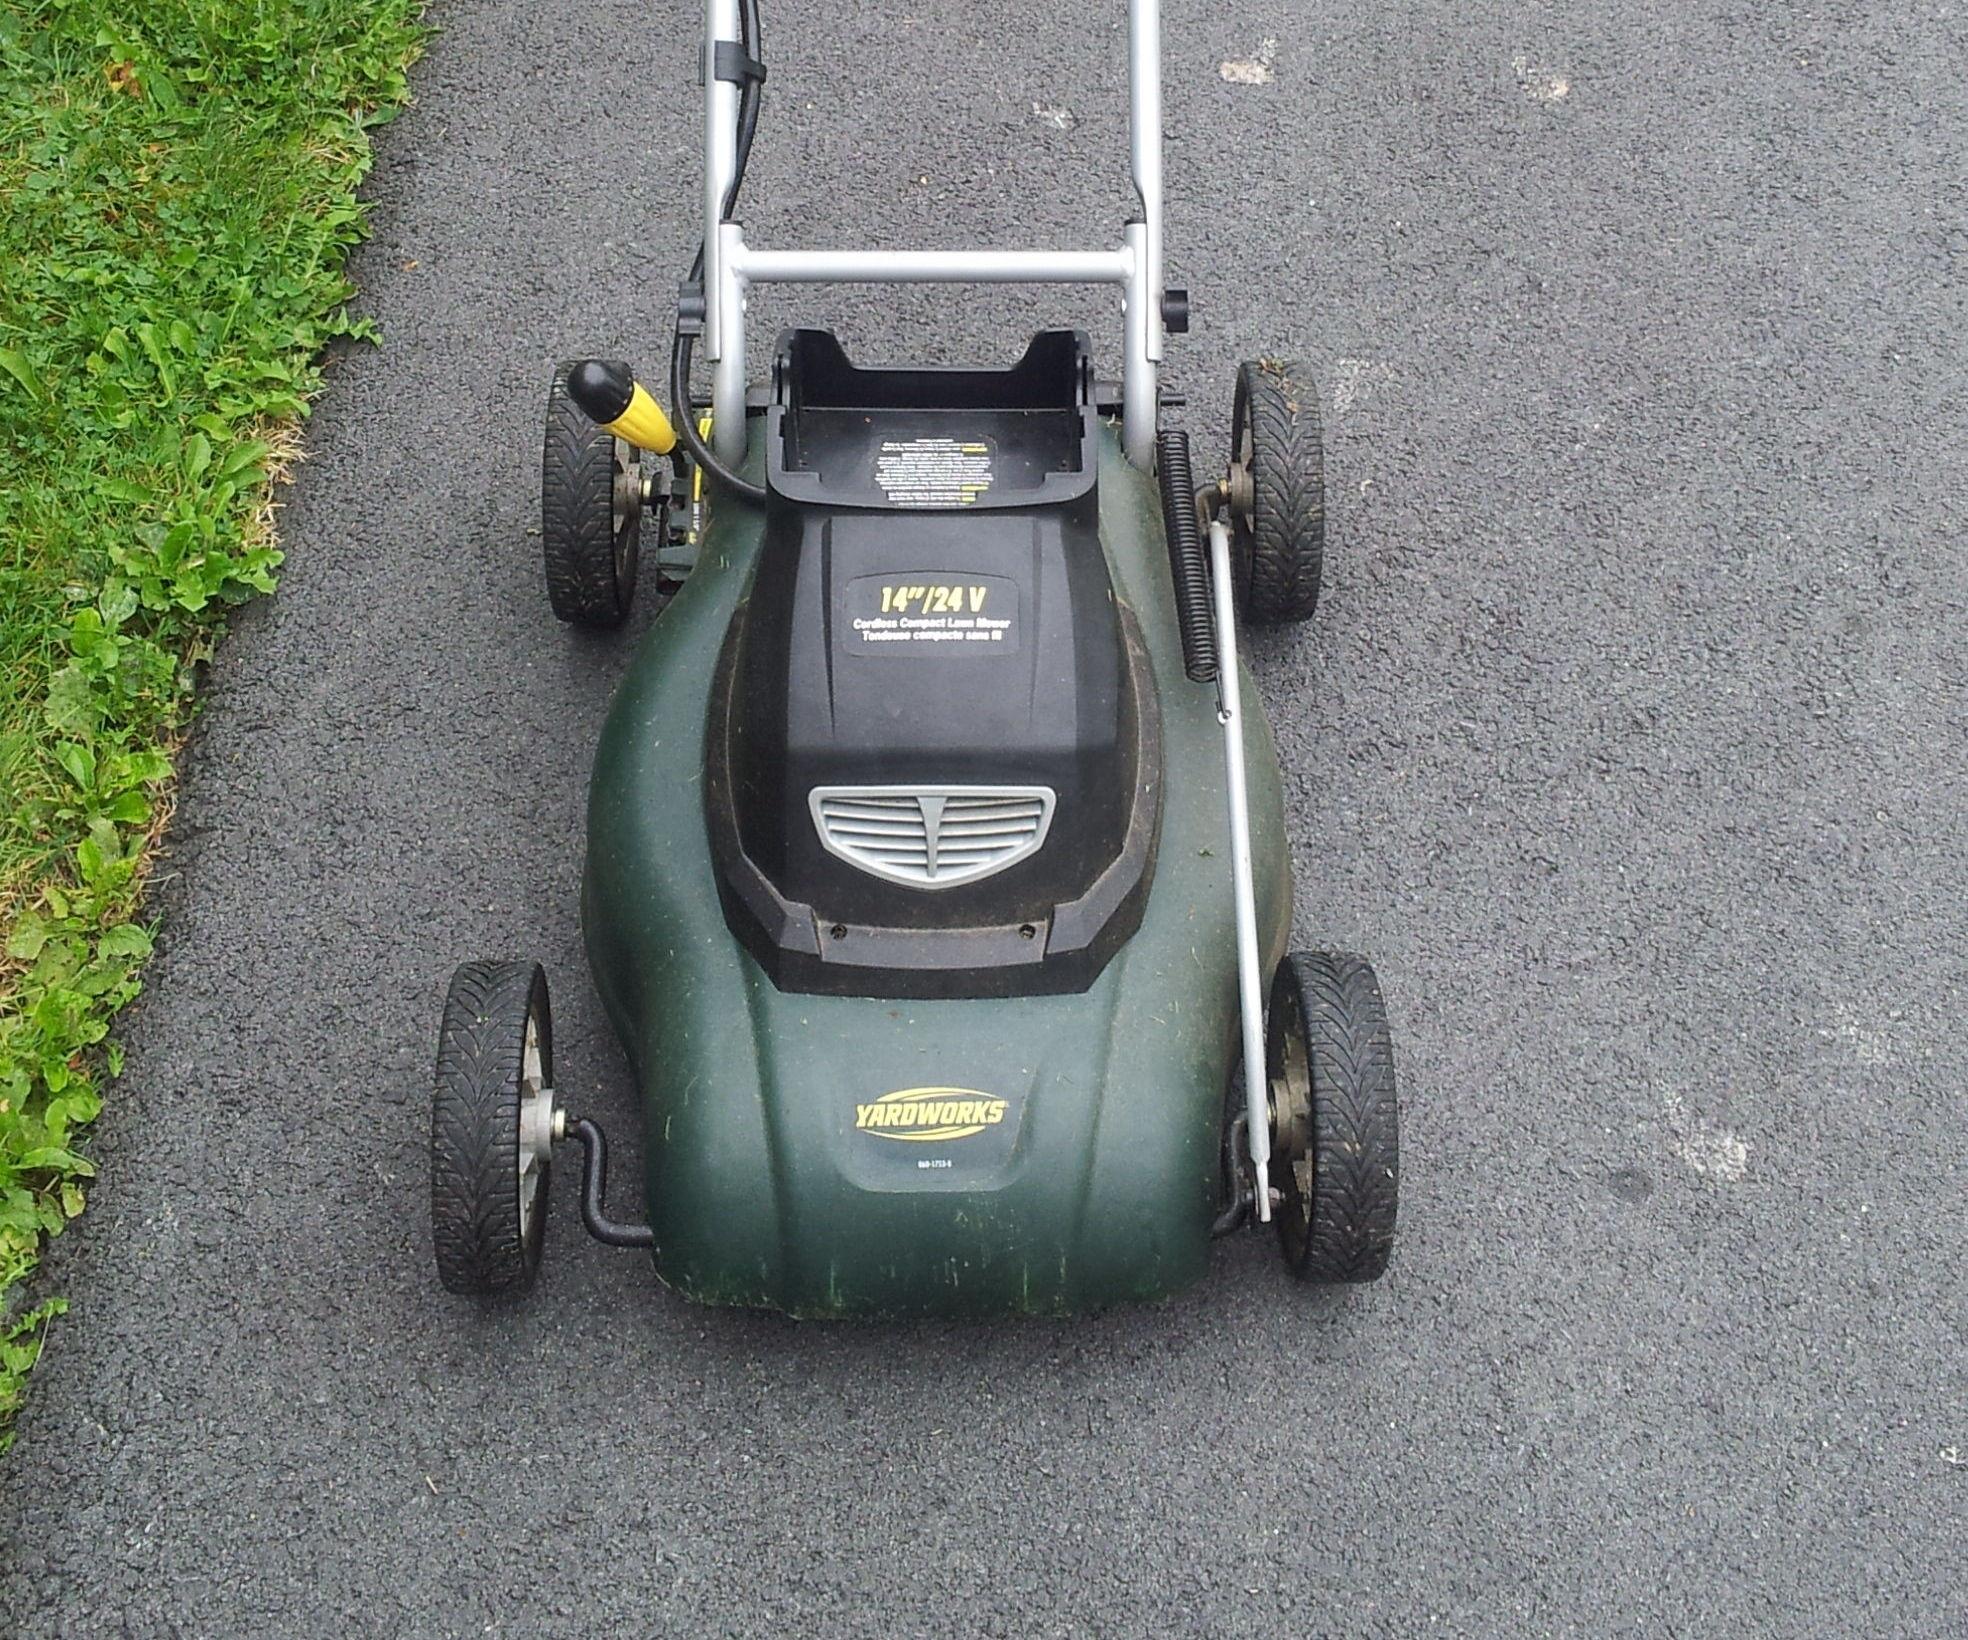 Solar power cordless lawn mower